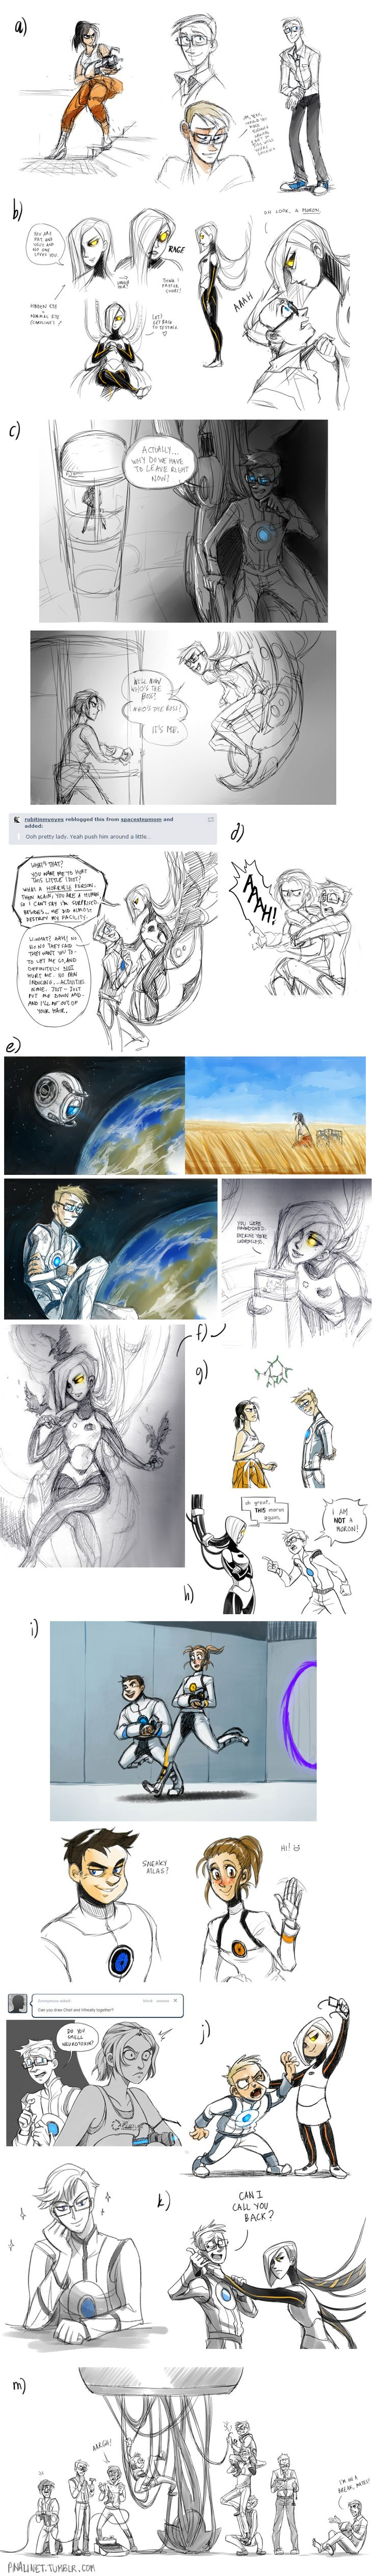 Portal 2 Sketchdump by pinali.deviantart.com on @deviantART